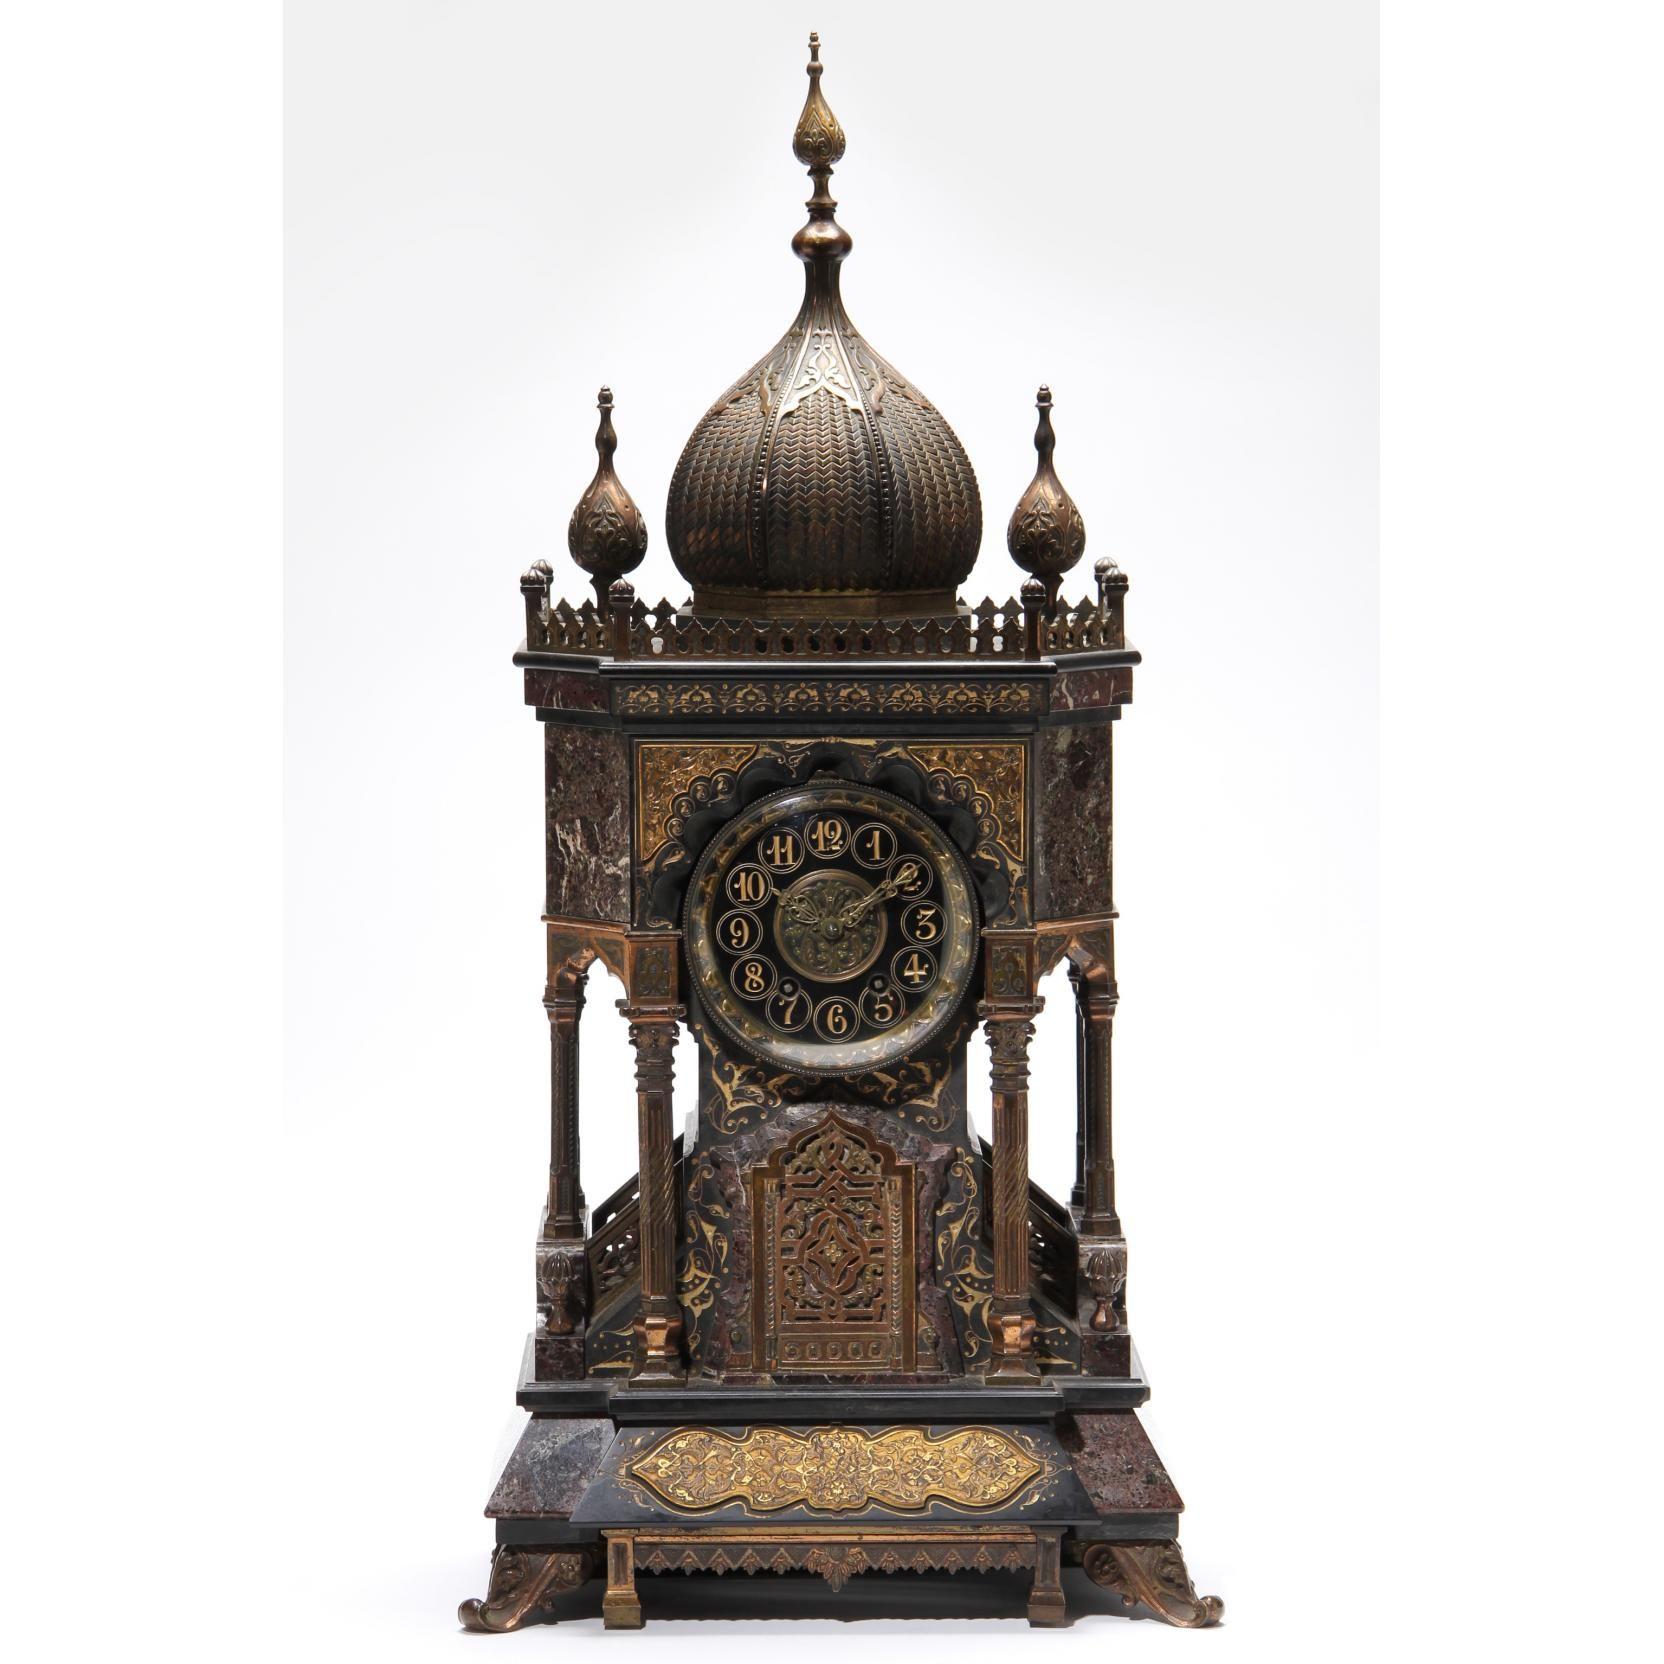 Tiffany & Co. Moorish revival mantel clock 1888  -  Leland Little